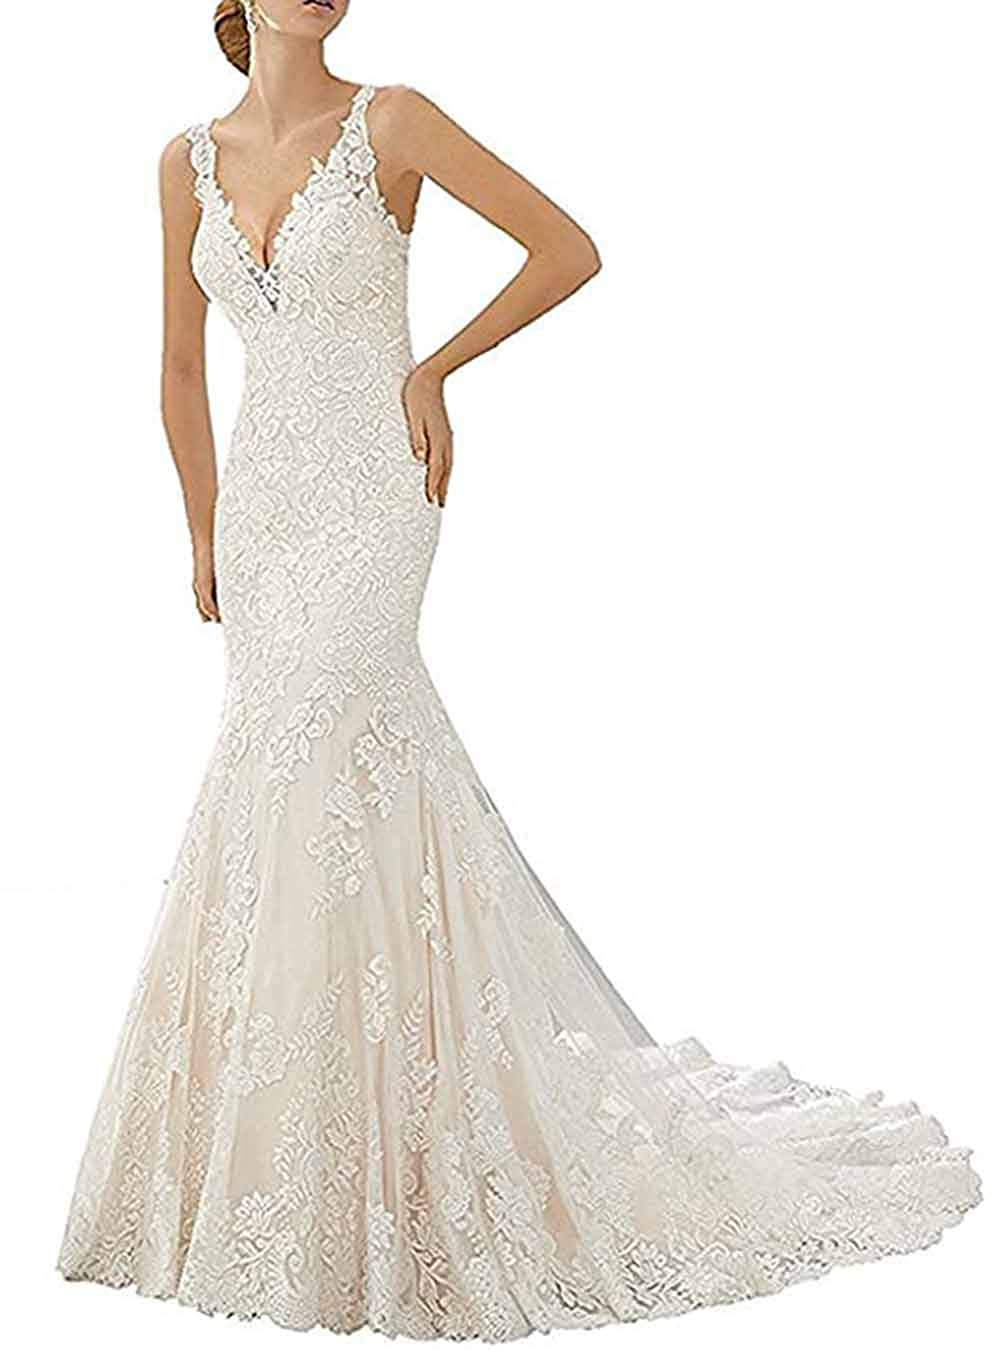 Ri Yun Womens Lace V Neck Mermaid Wedding Dresses Bridal Gown